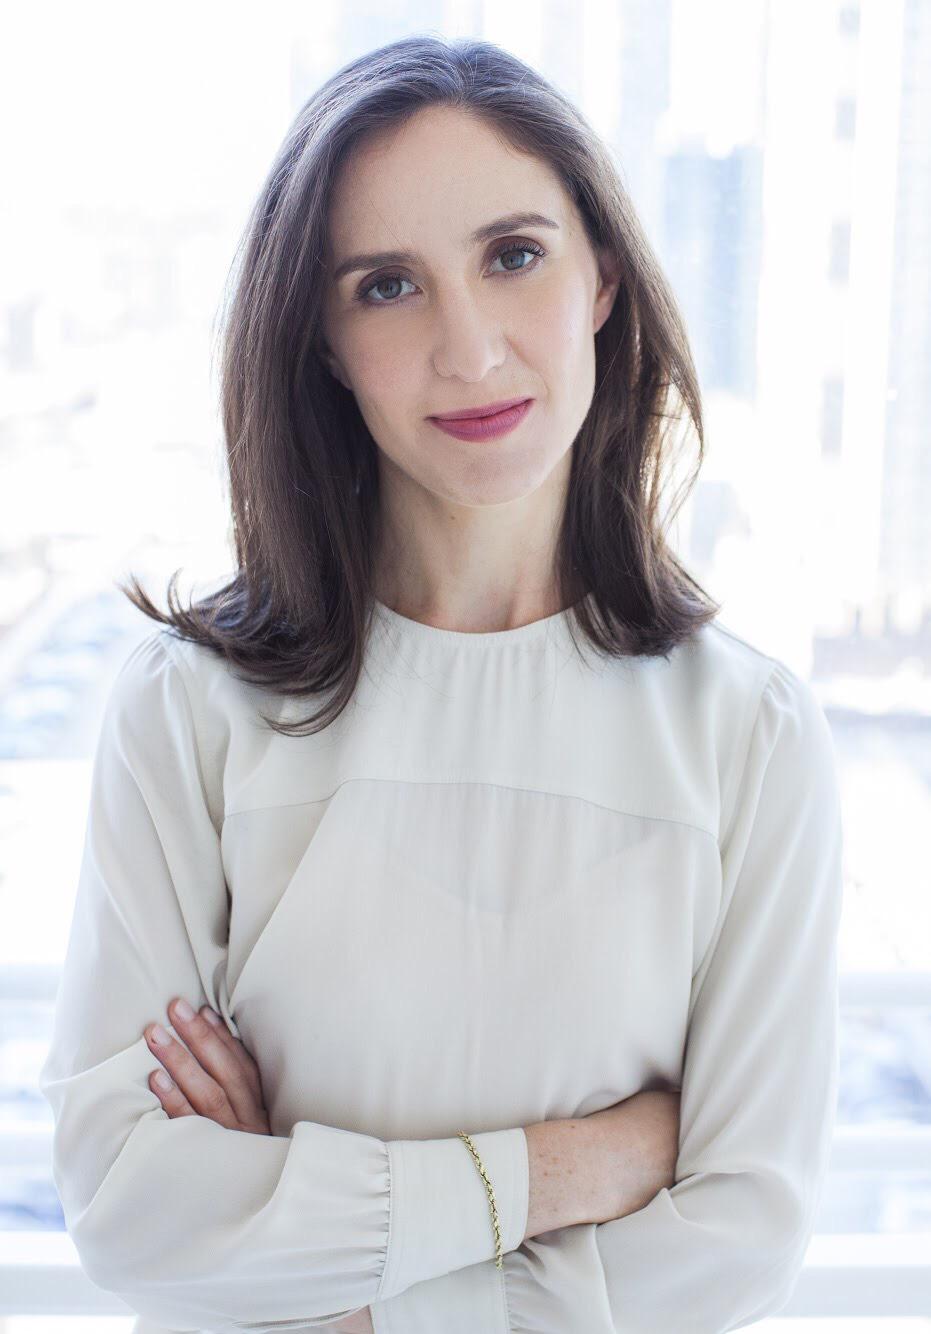 New York Times reporter Emily Steel